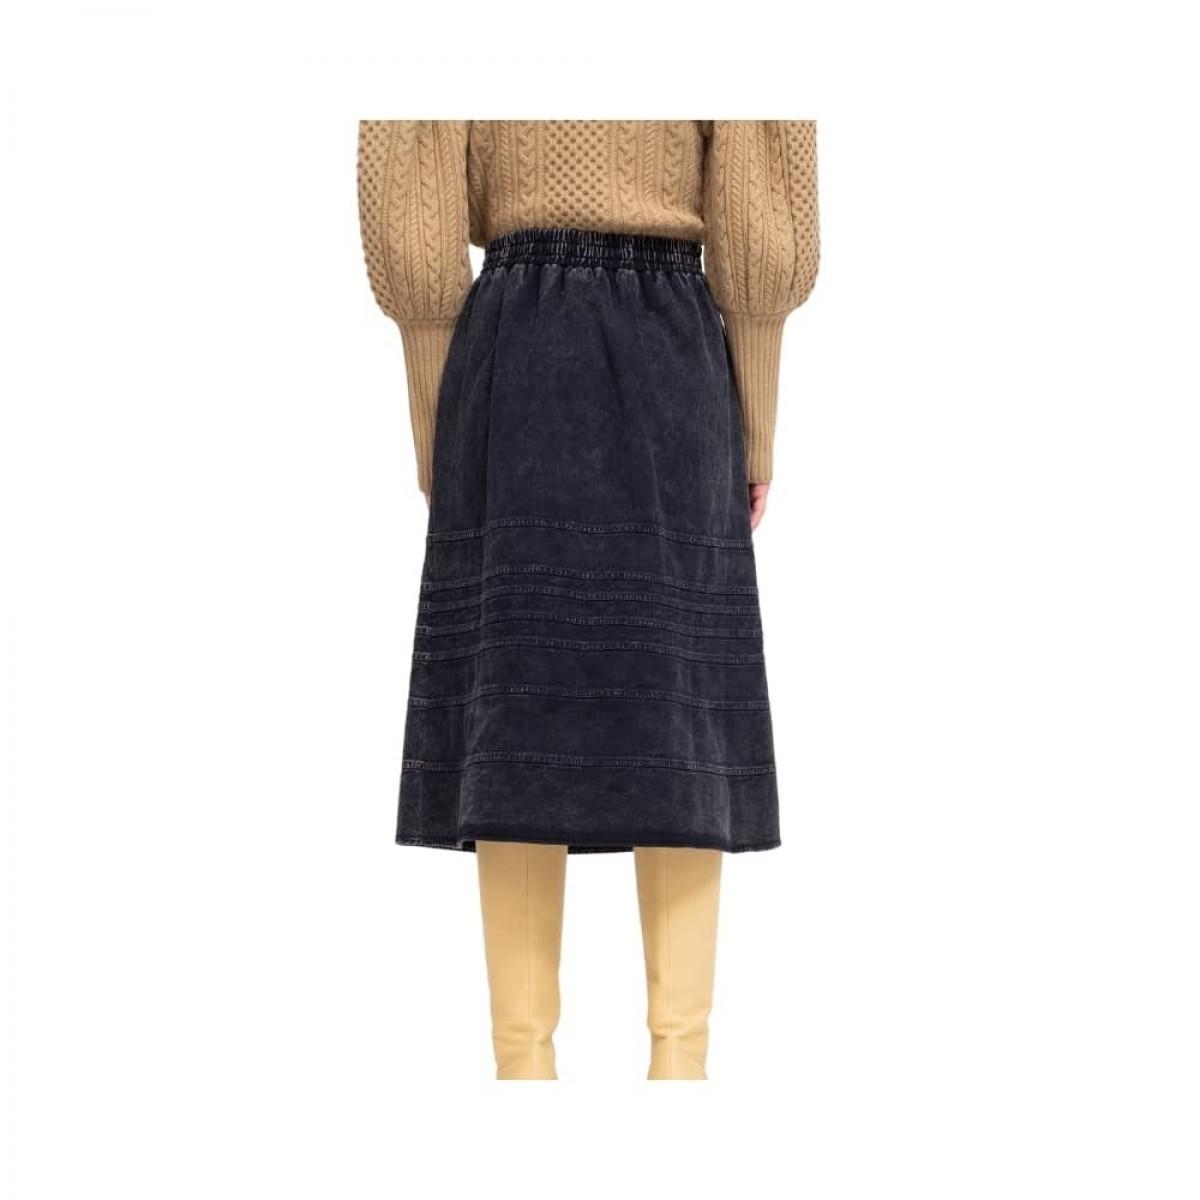 maura denim skirt - navy - bag